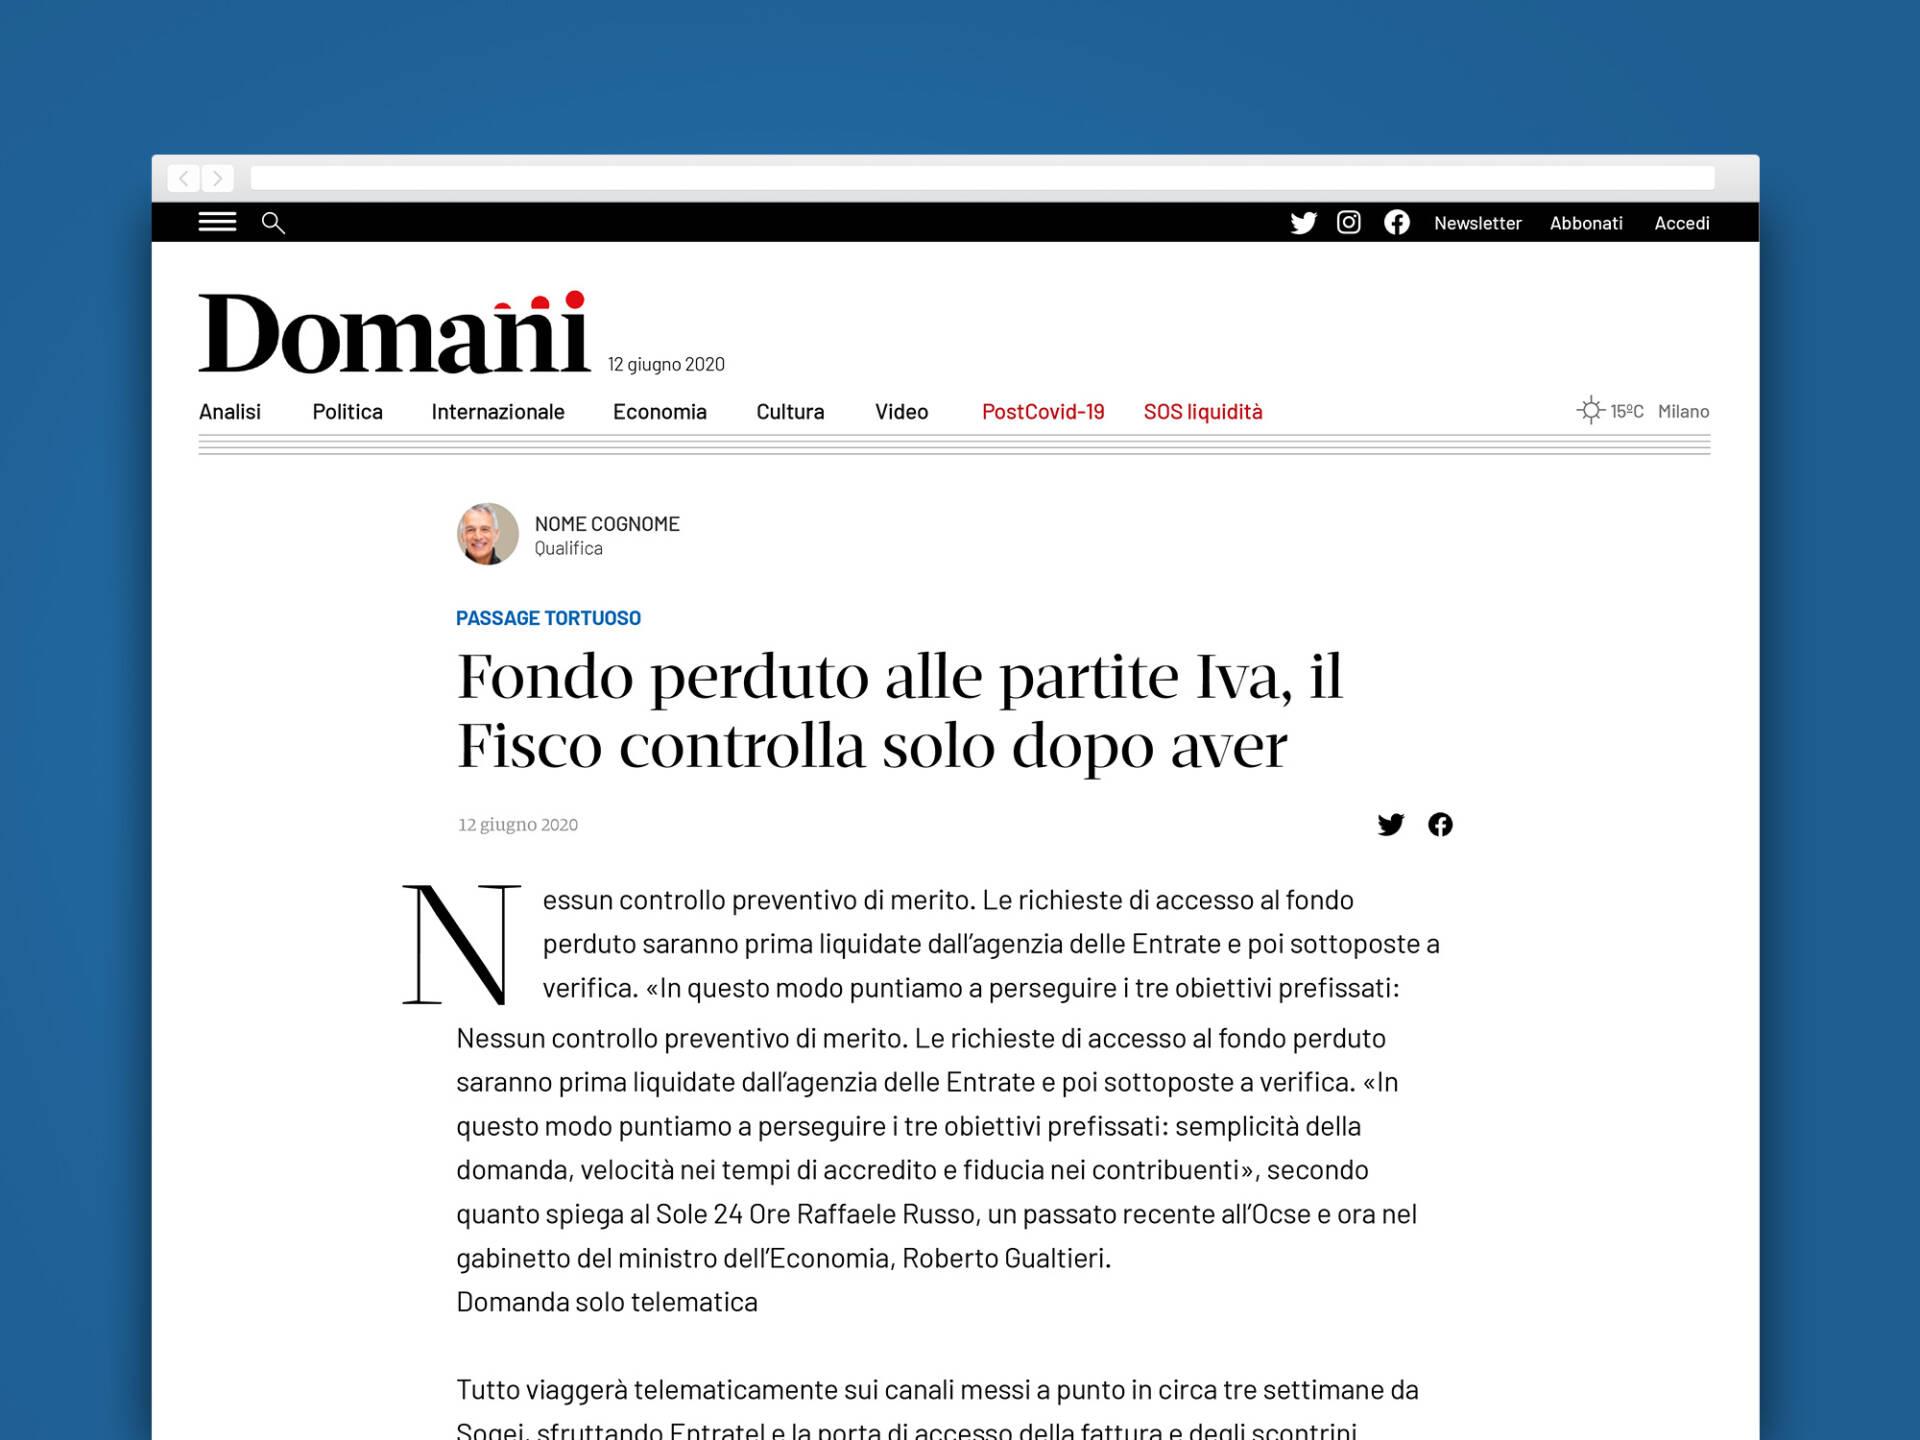 Domani_Web_Wenceslau_News_Design_7